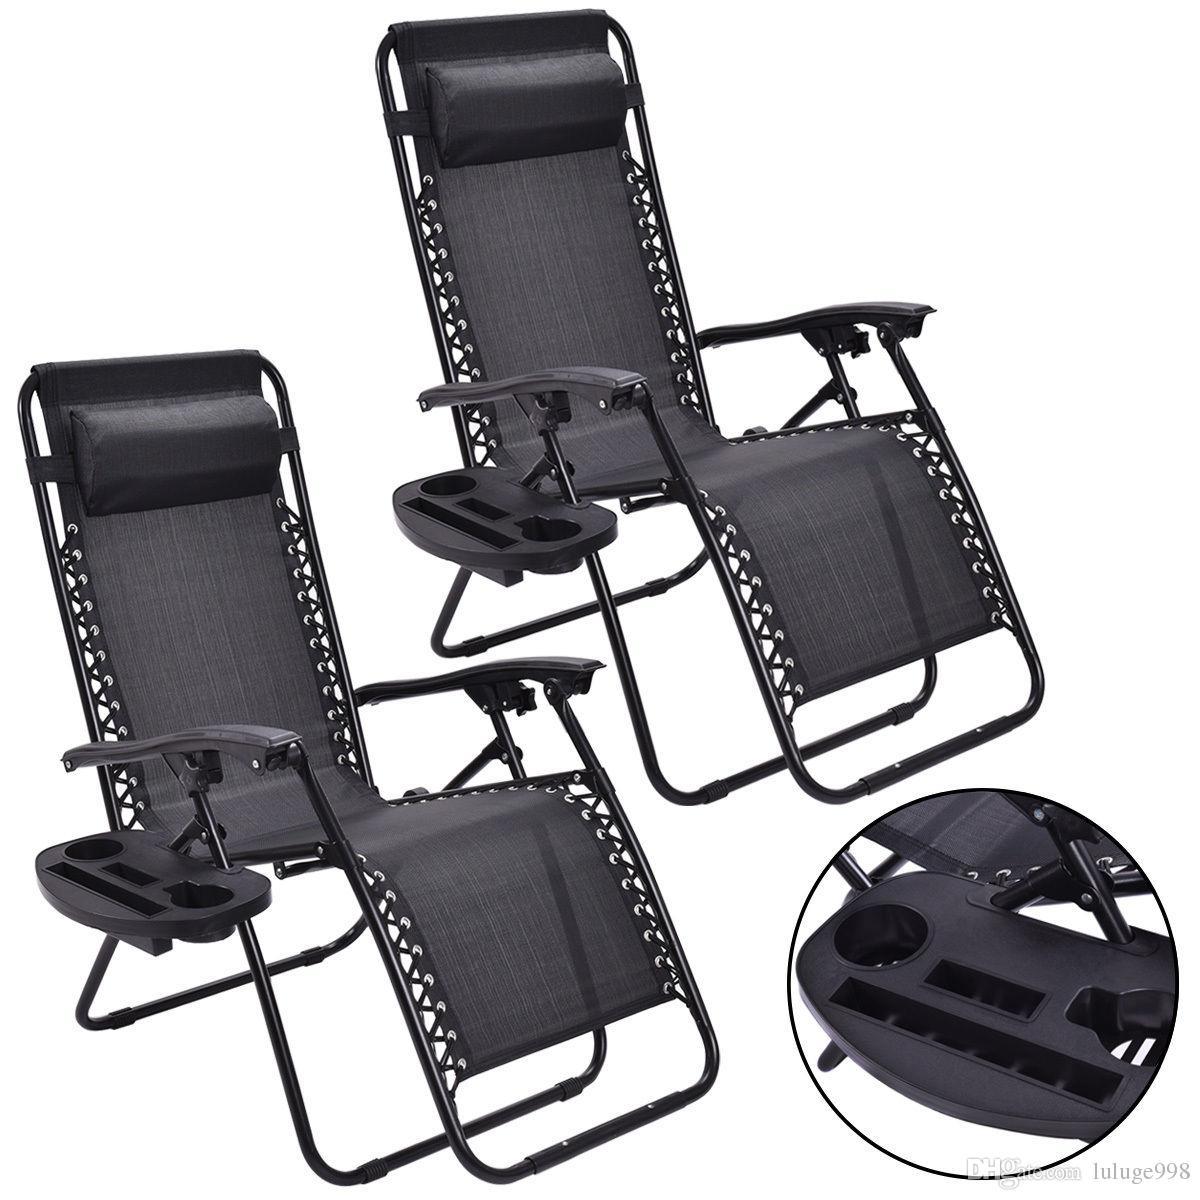 2PC 제로 중력 라운지 파티오 접는 안락 의자 야외 블랙 W / 컵 홀더 의자